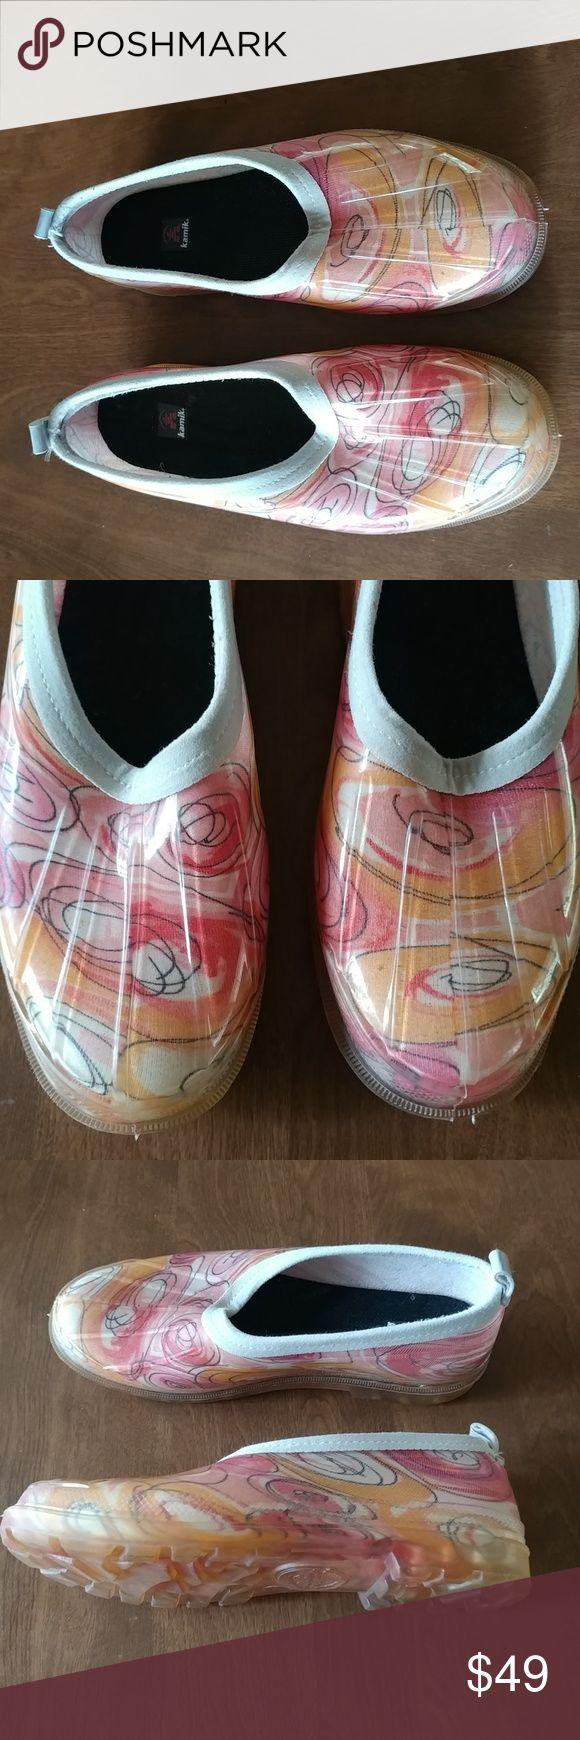 KAMIK Womens Jelly Rain Shoes Size 7 Semi Transparent Waterproof Geometric Print Rubber Top Sider KAMIK Shoes Winter & Rain Boots